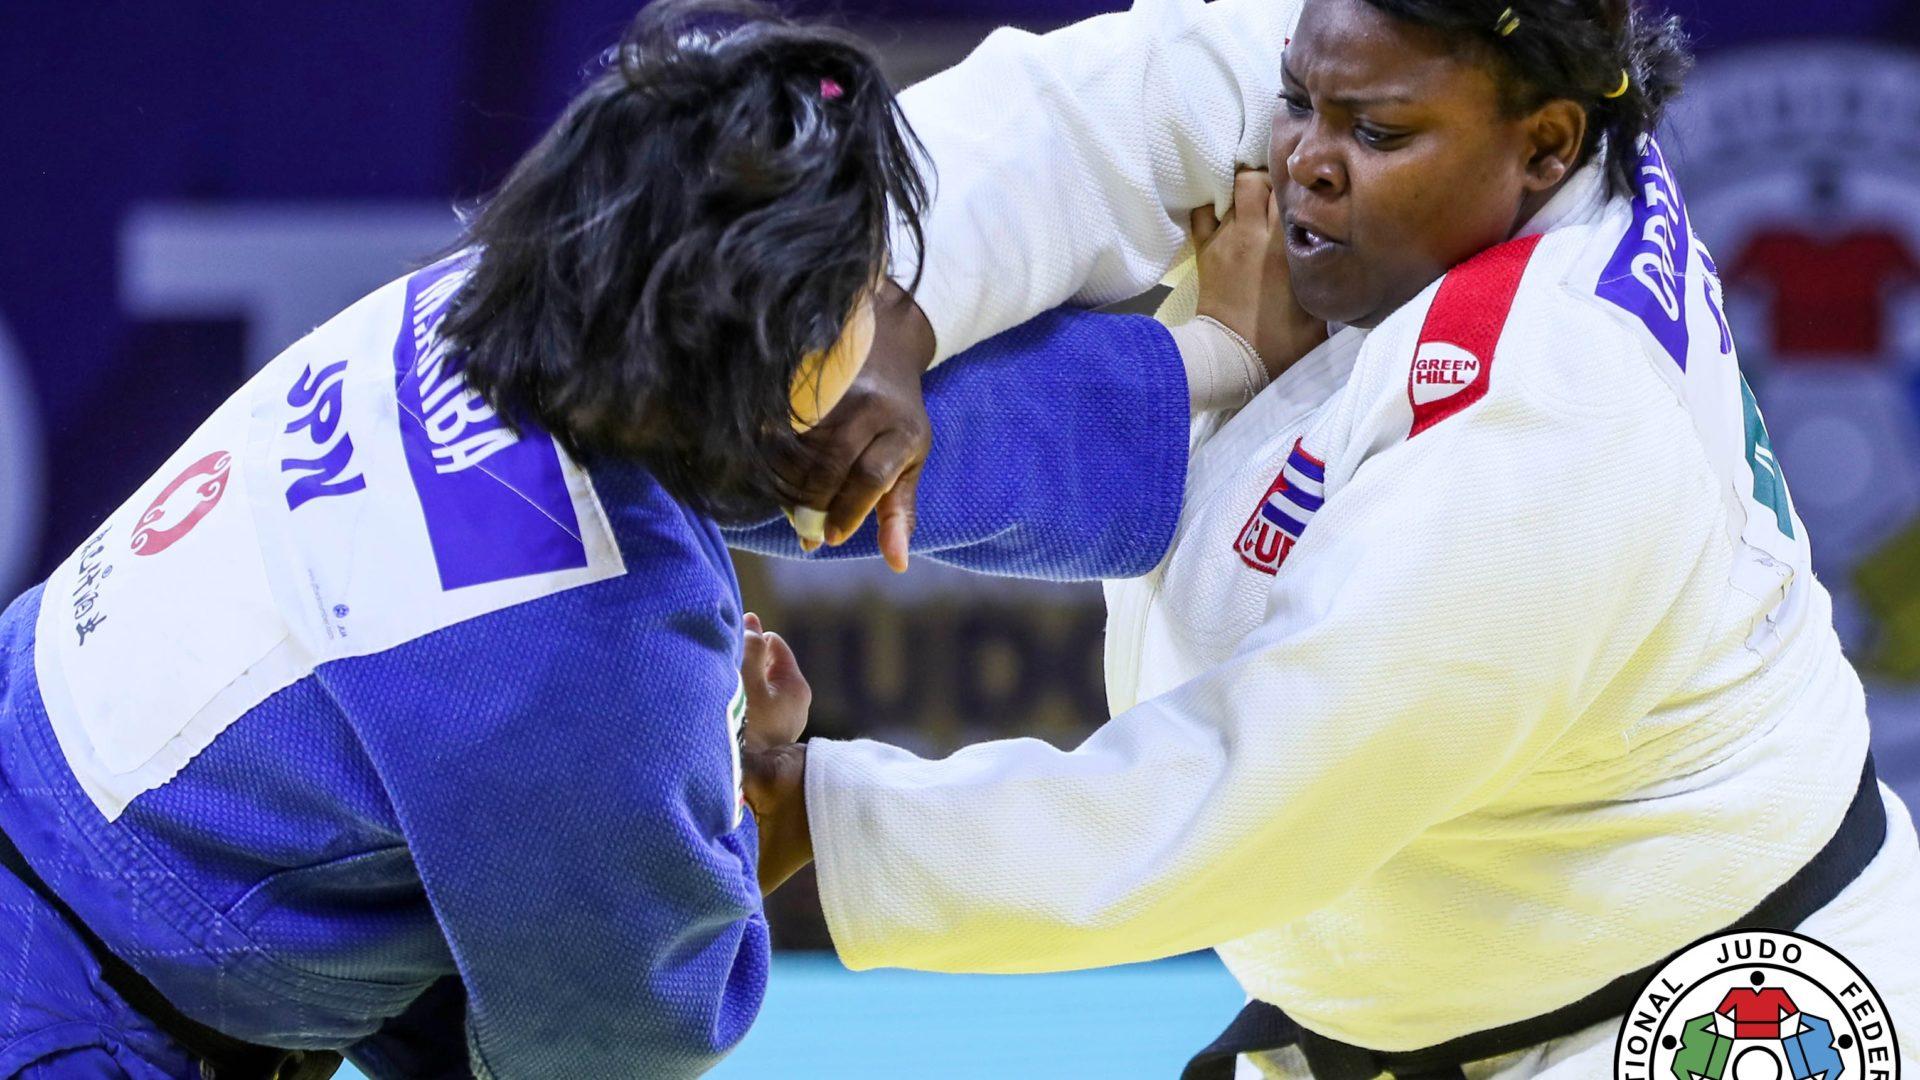 Cuba cierra con tres medallas el Grand Prix de Hohhot